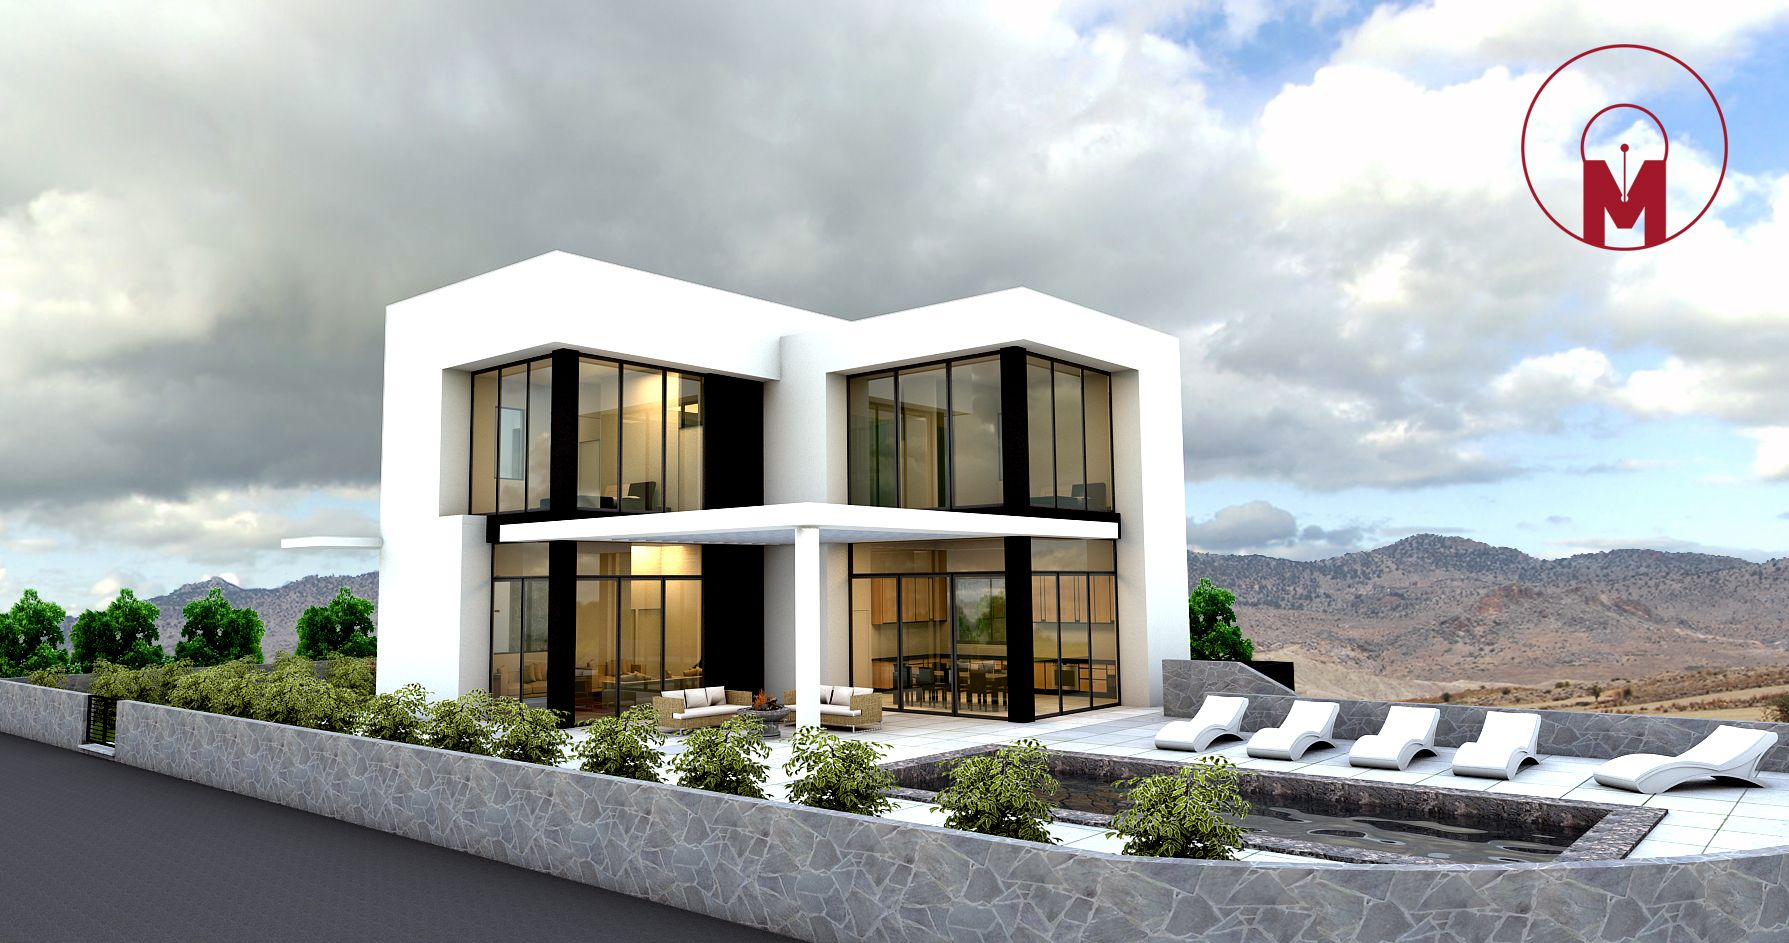 Engineer's House/ Dikmen, Architect : Onur Olguner Civil Engineer : Mehmet Aydın Öncülay, Olguner Design Studio